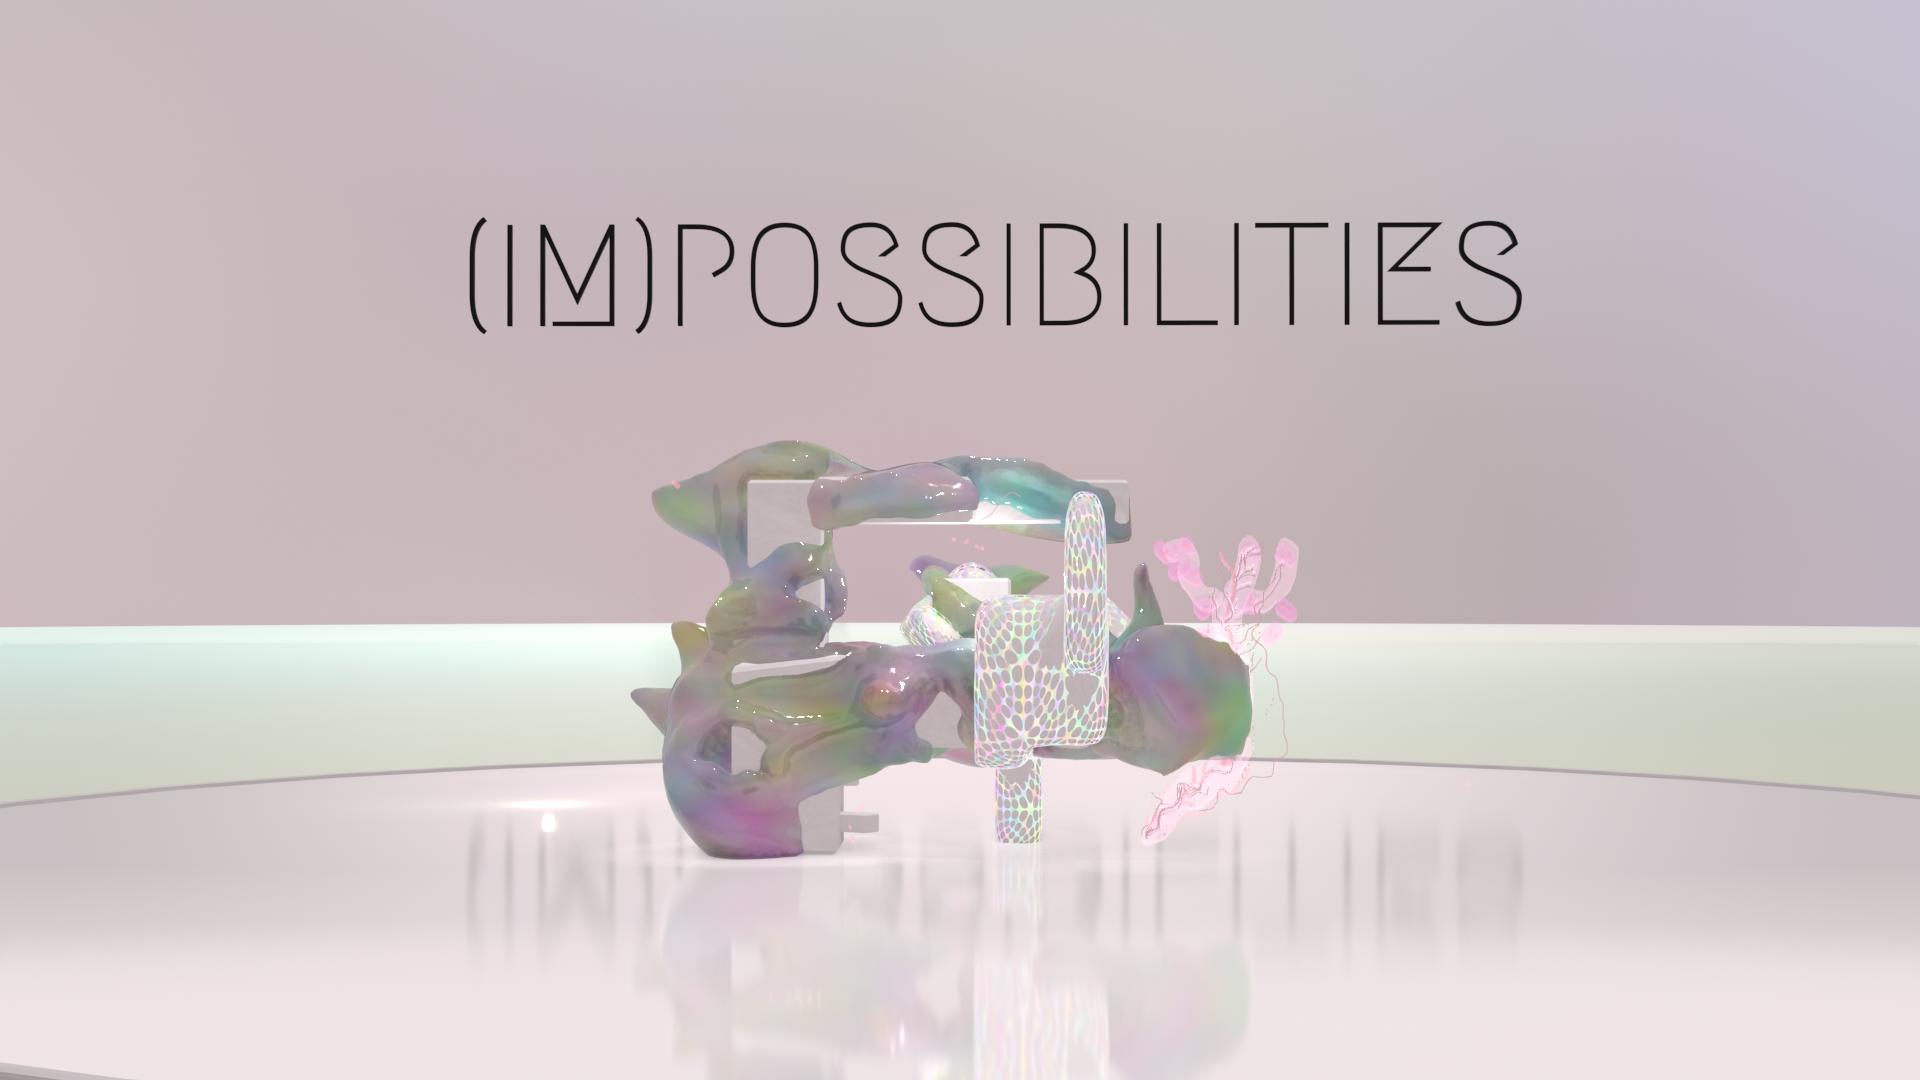 (IM)Possibilities